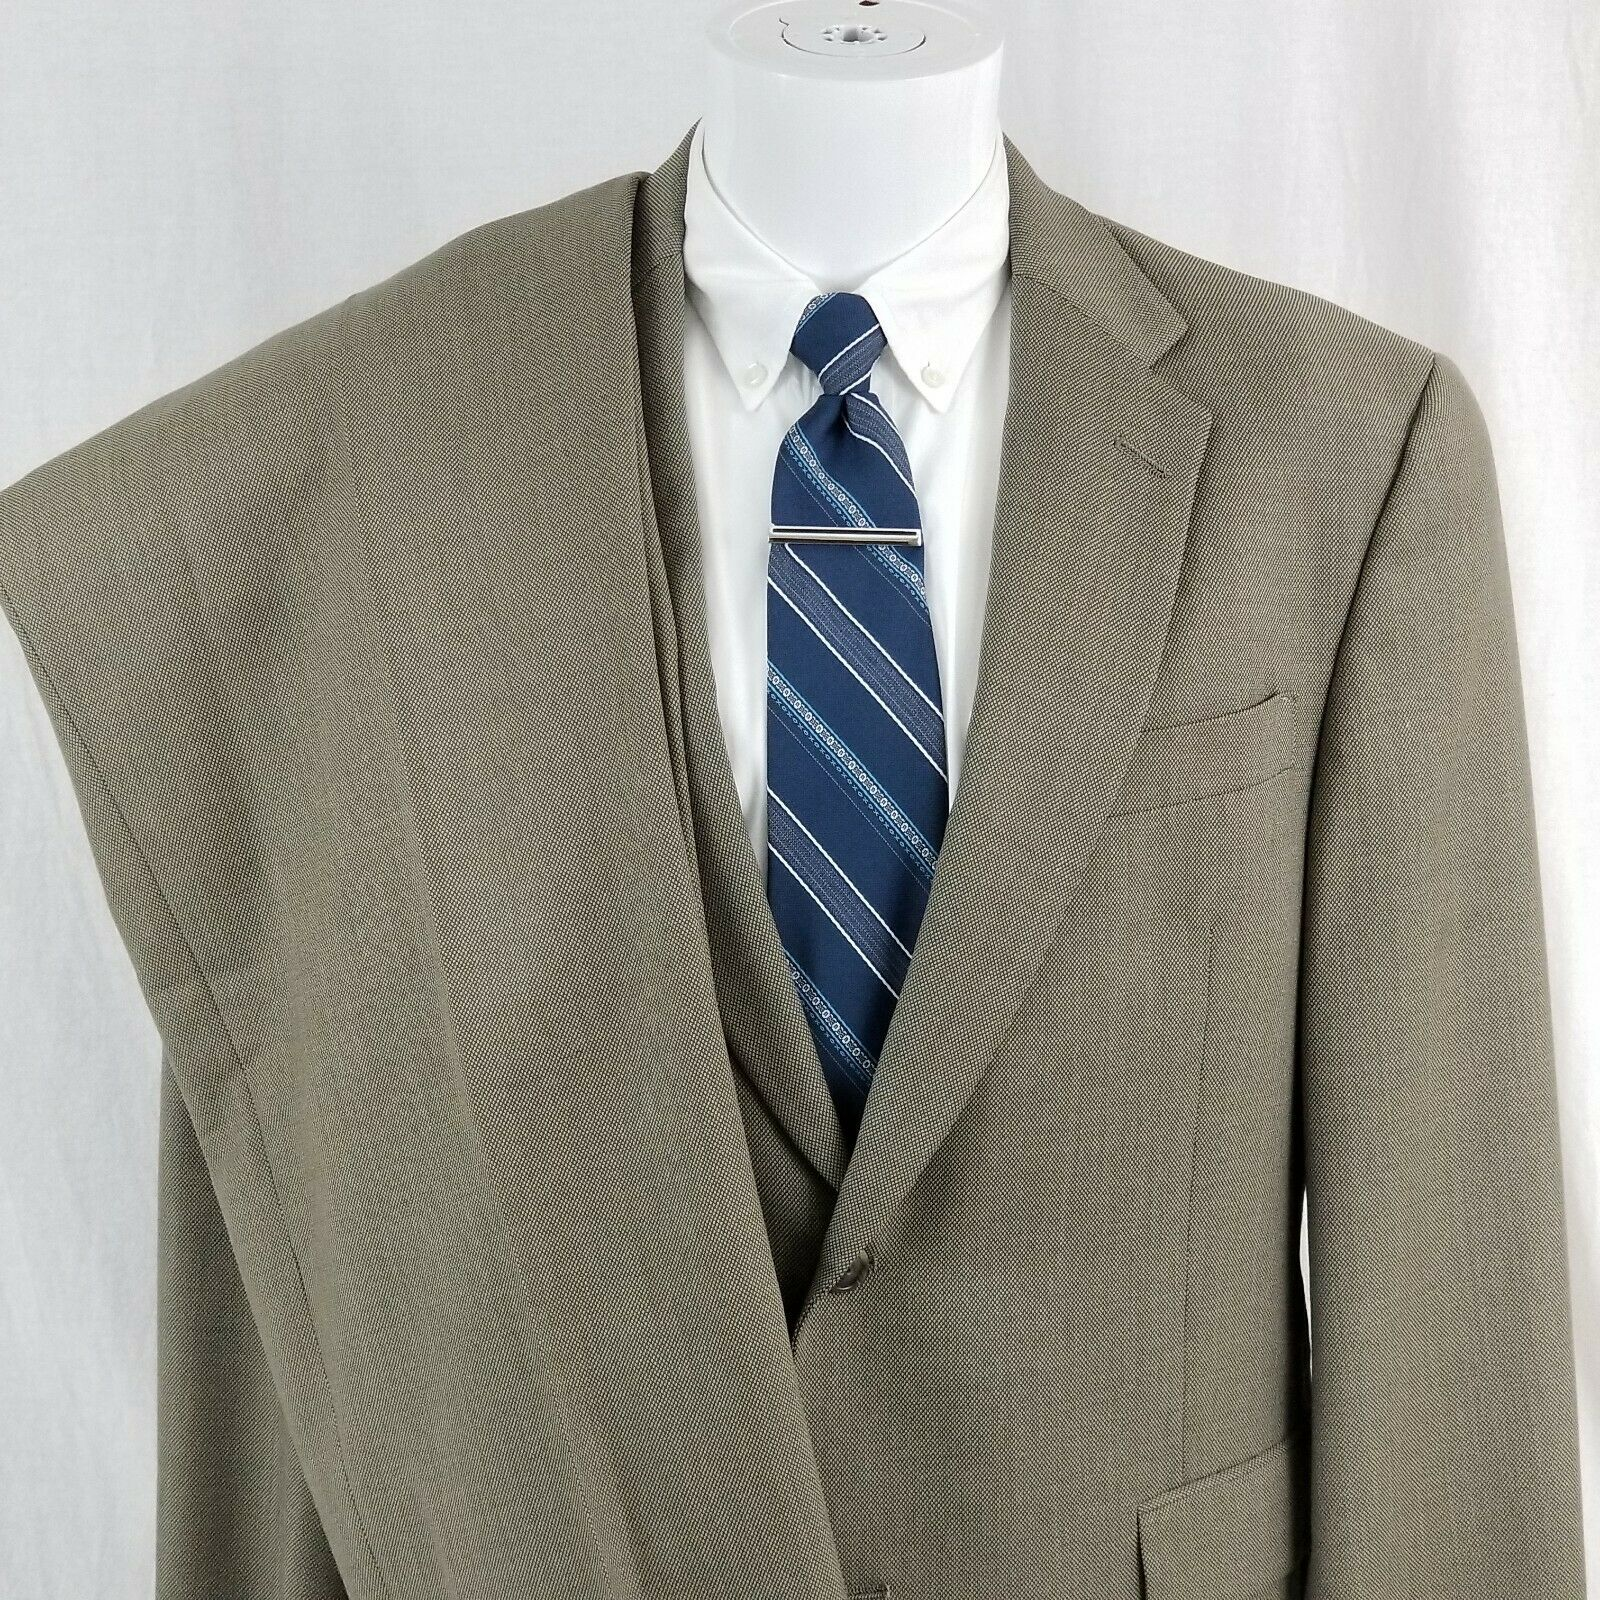 3fda97b8 Hart Schaffner Marx Men's 40 R 2 Button Brown Wool Suit Pleated 35 x 27.5